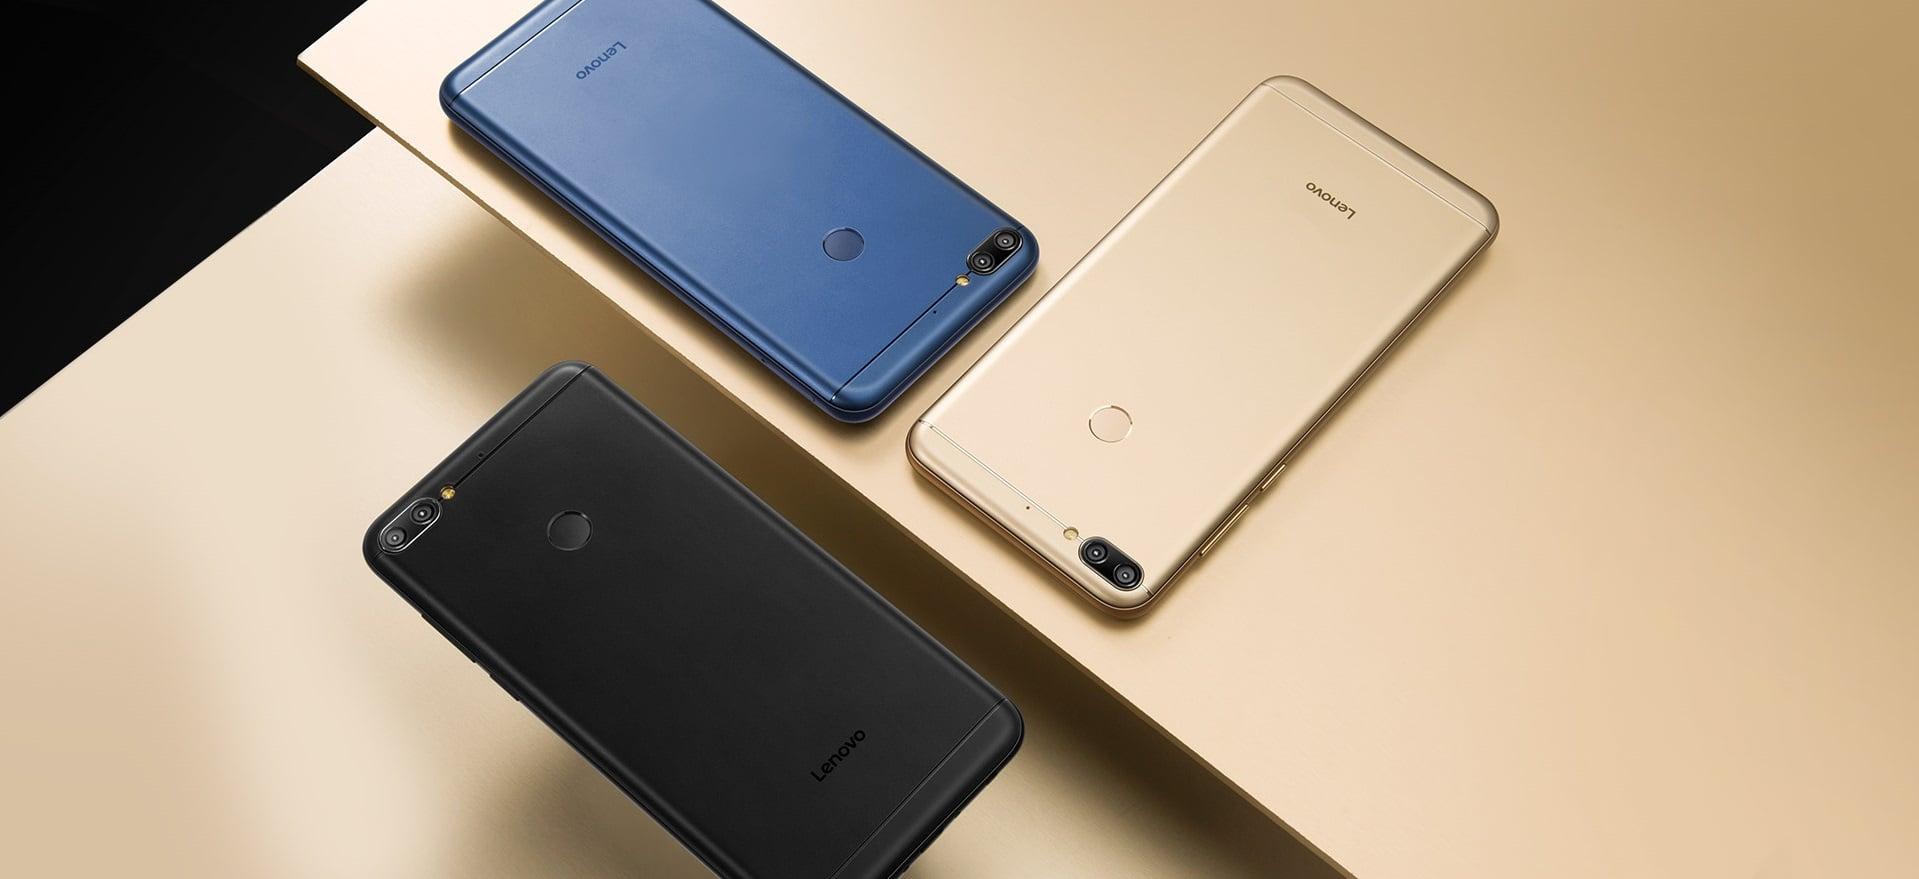 Lenovo prezentuje: smartfony Lenovo K5 Note 2018 i Lenovo A5 oraz smartwatch Lenovo Watch X (Plus) 18